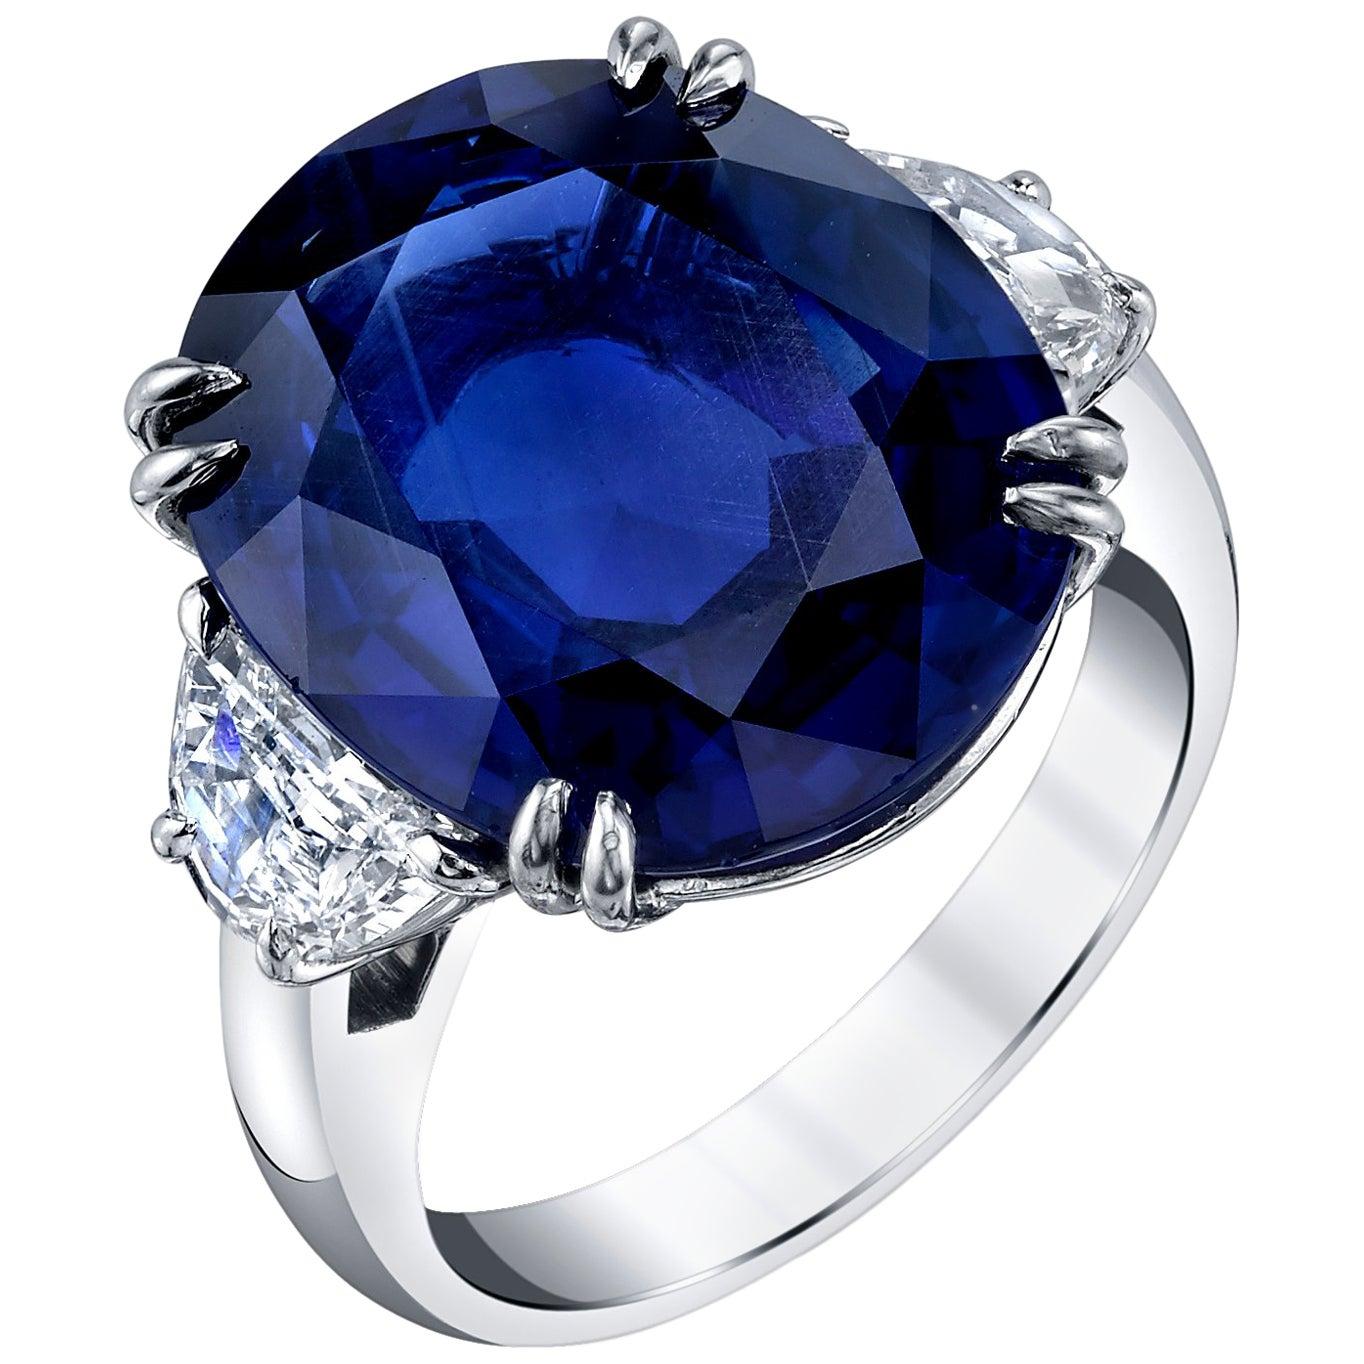 Unheated 12.23 Carat Ceylon Blue Sapphire GIA, Diamond Platinum 3-Stone Ring